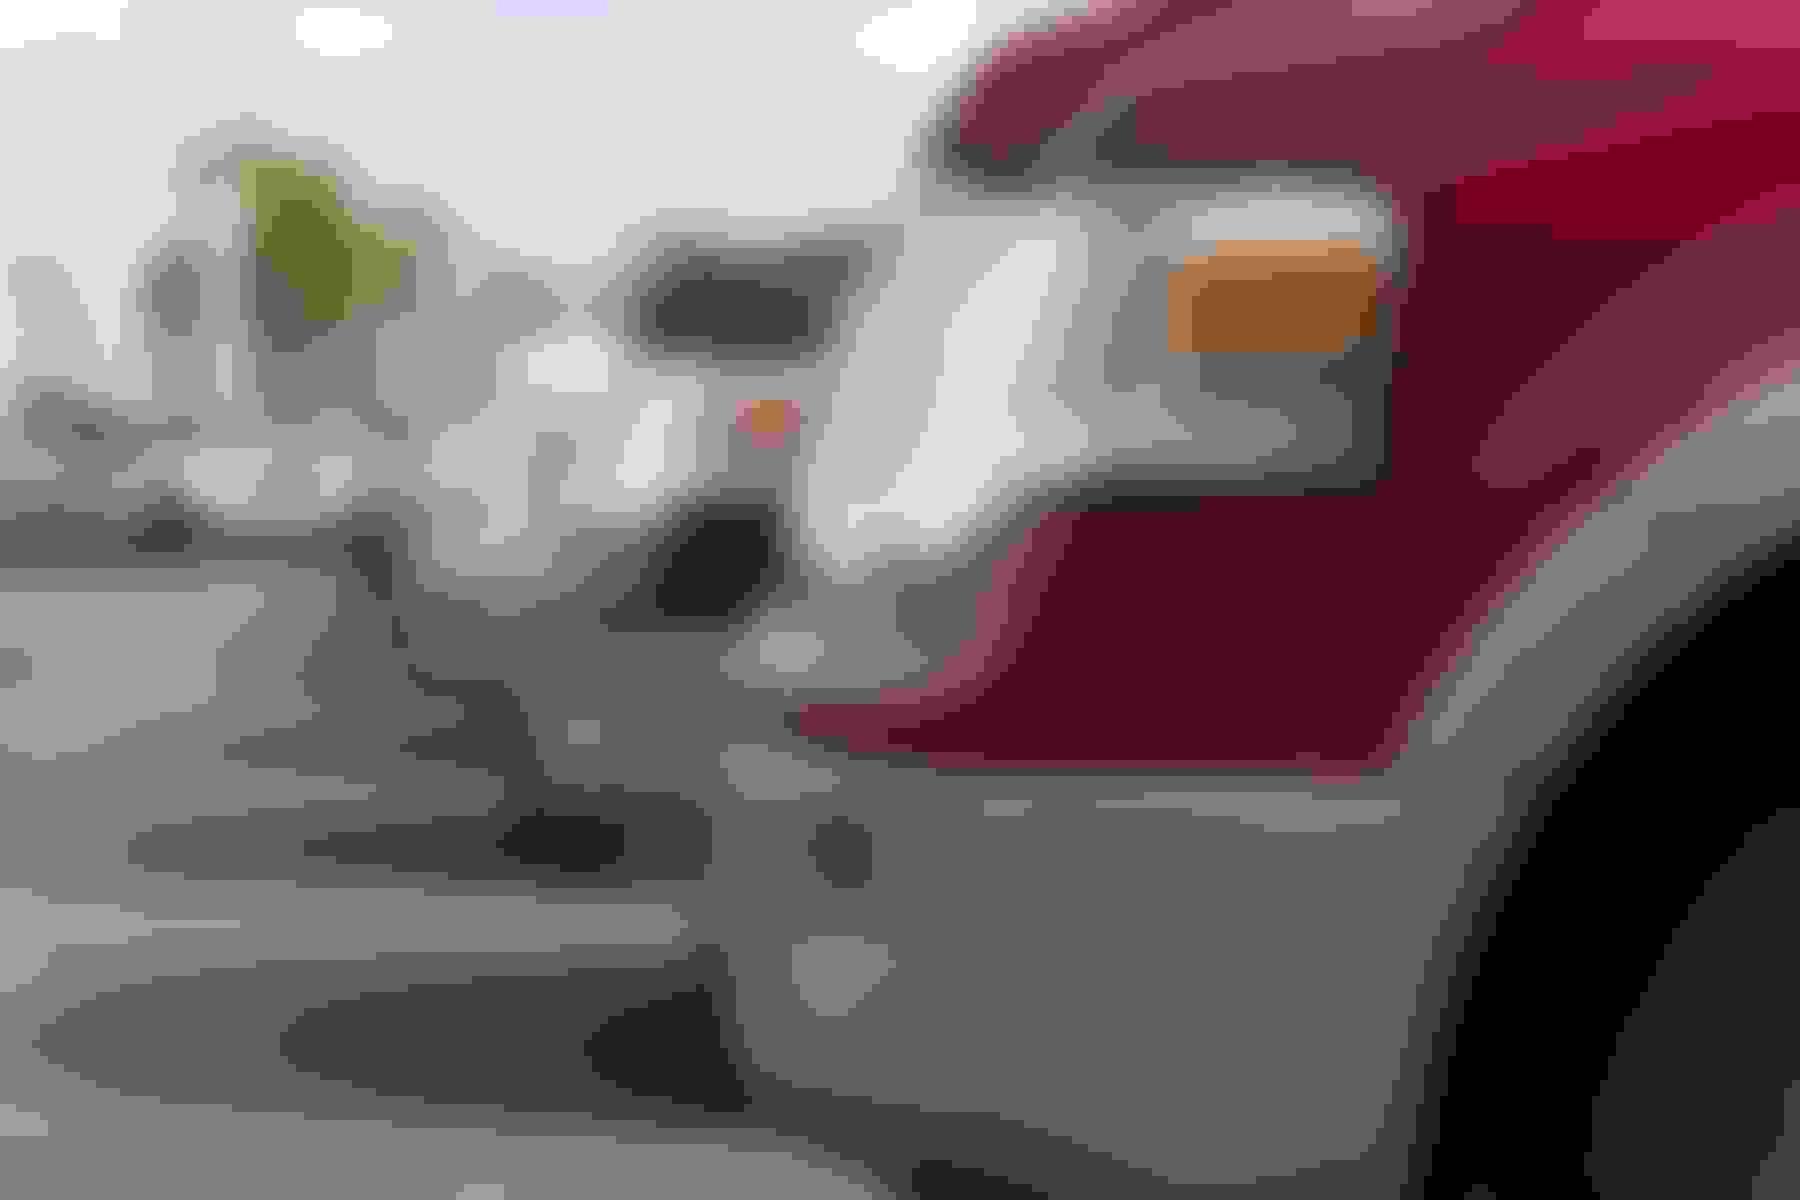 closeup of pick up truck bumpers